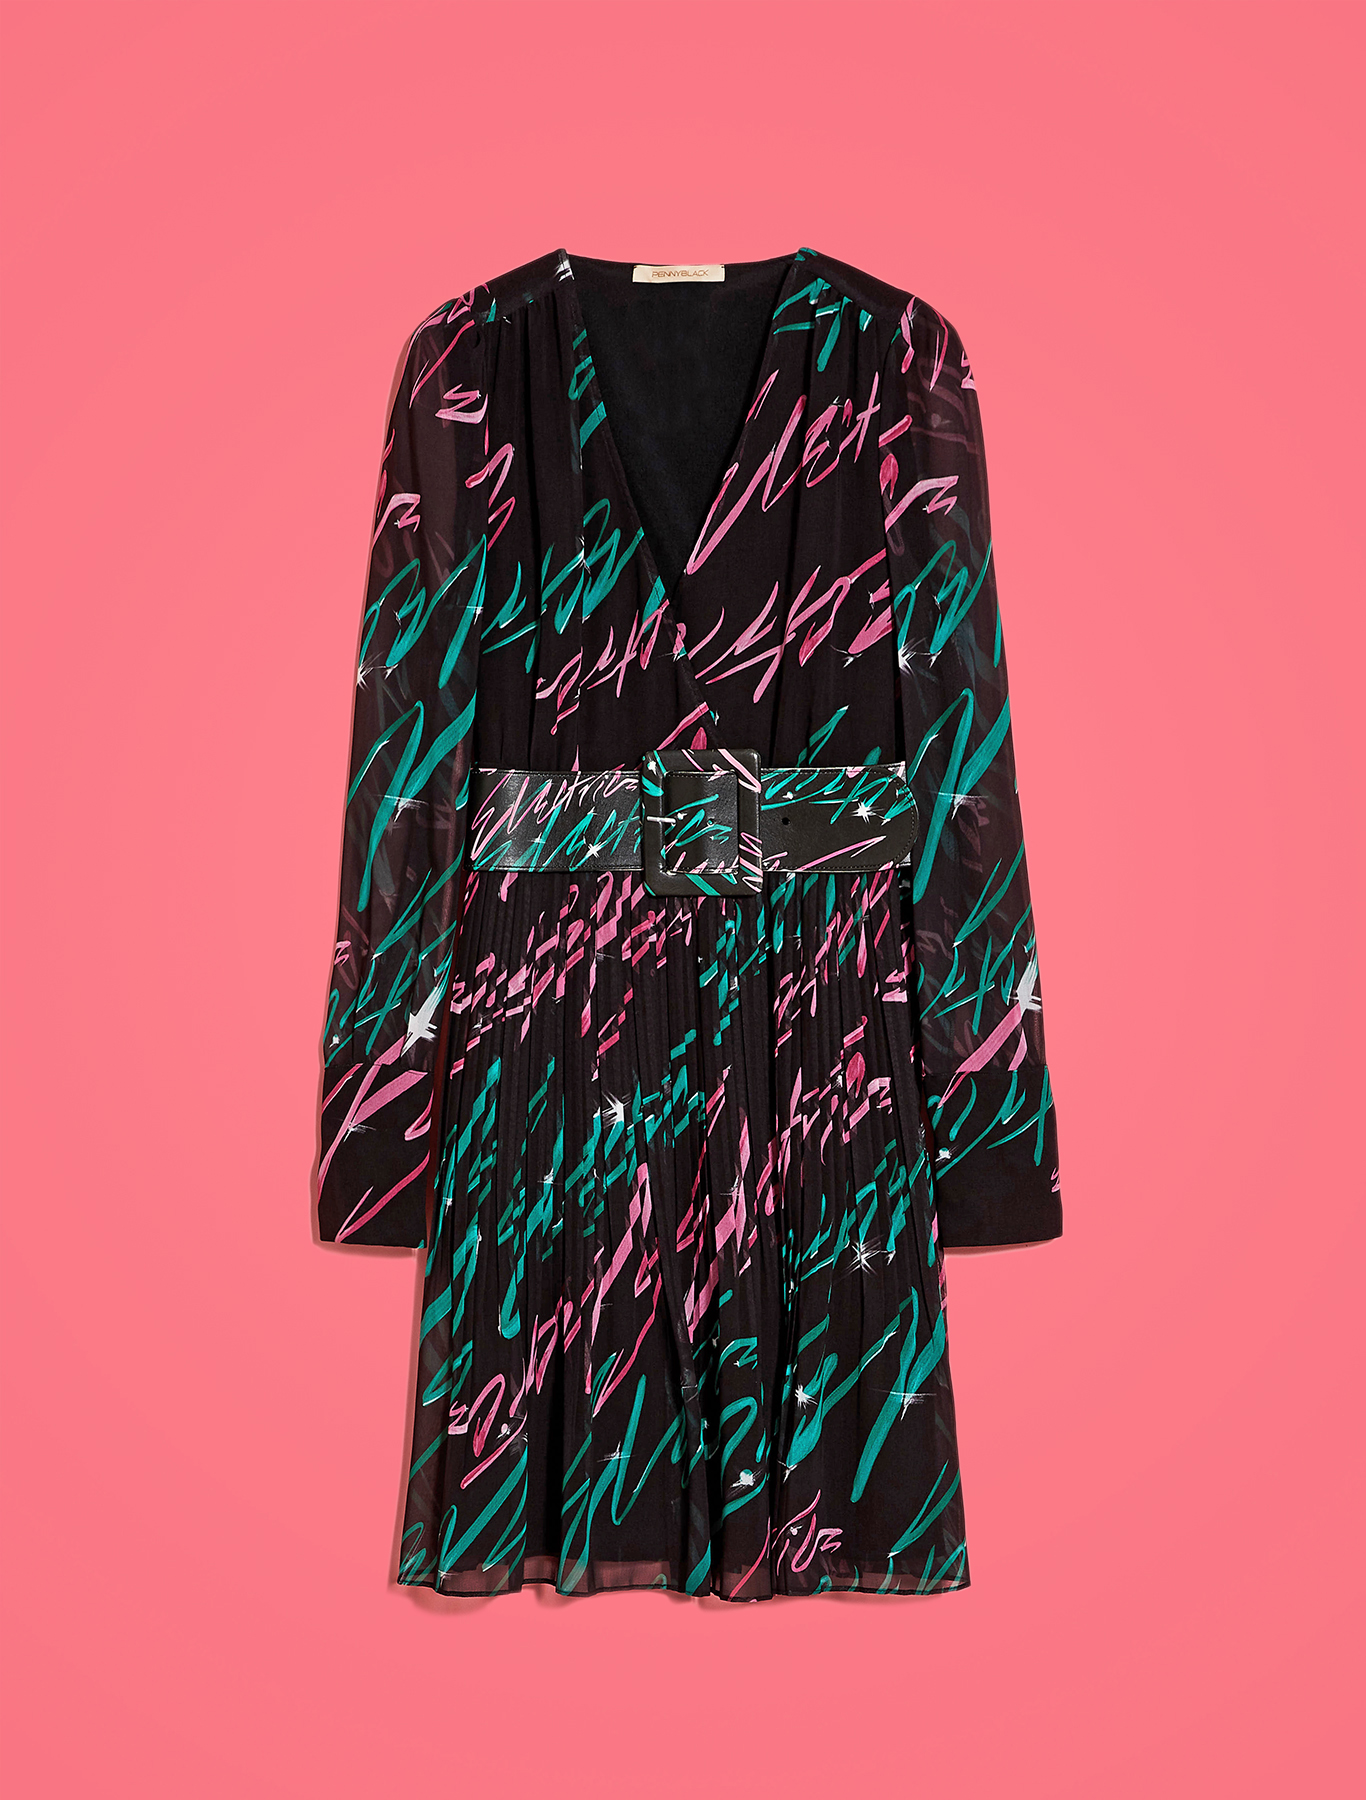 Electric Feel by Spiros Halaris Georgette dress - black pattern - pennyblack